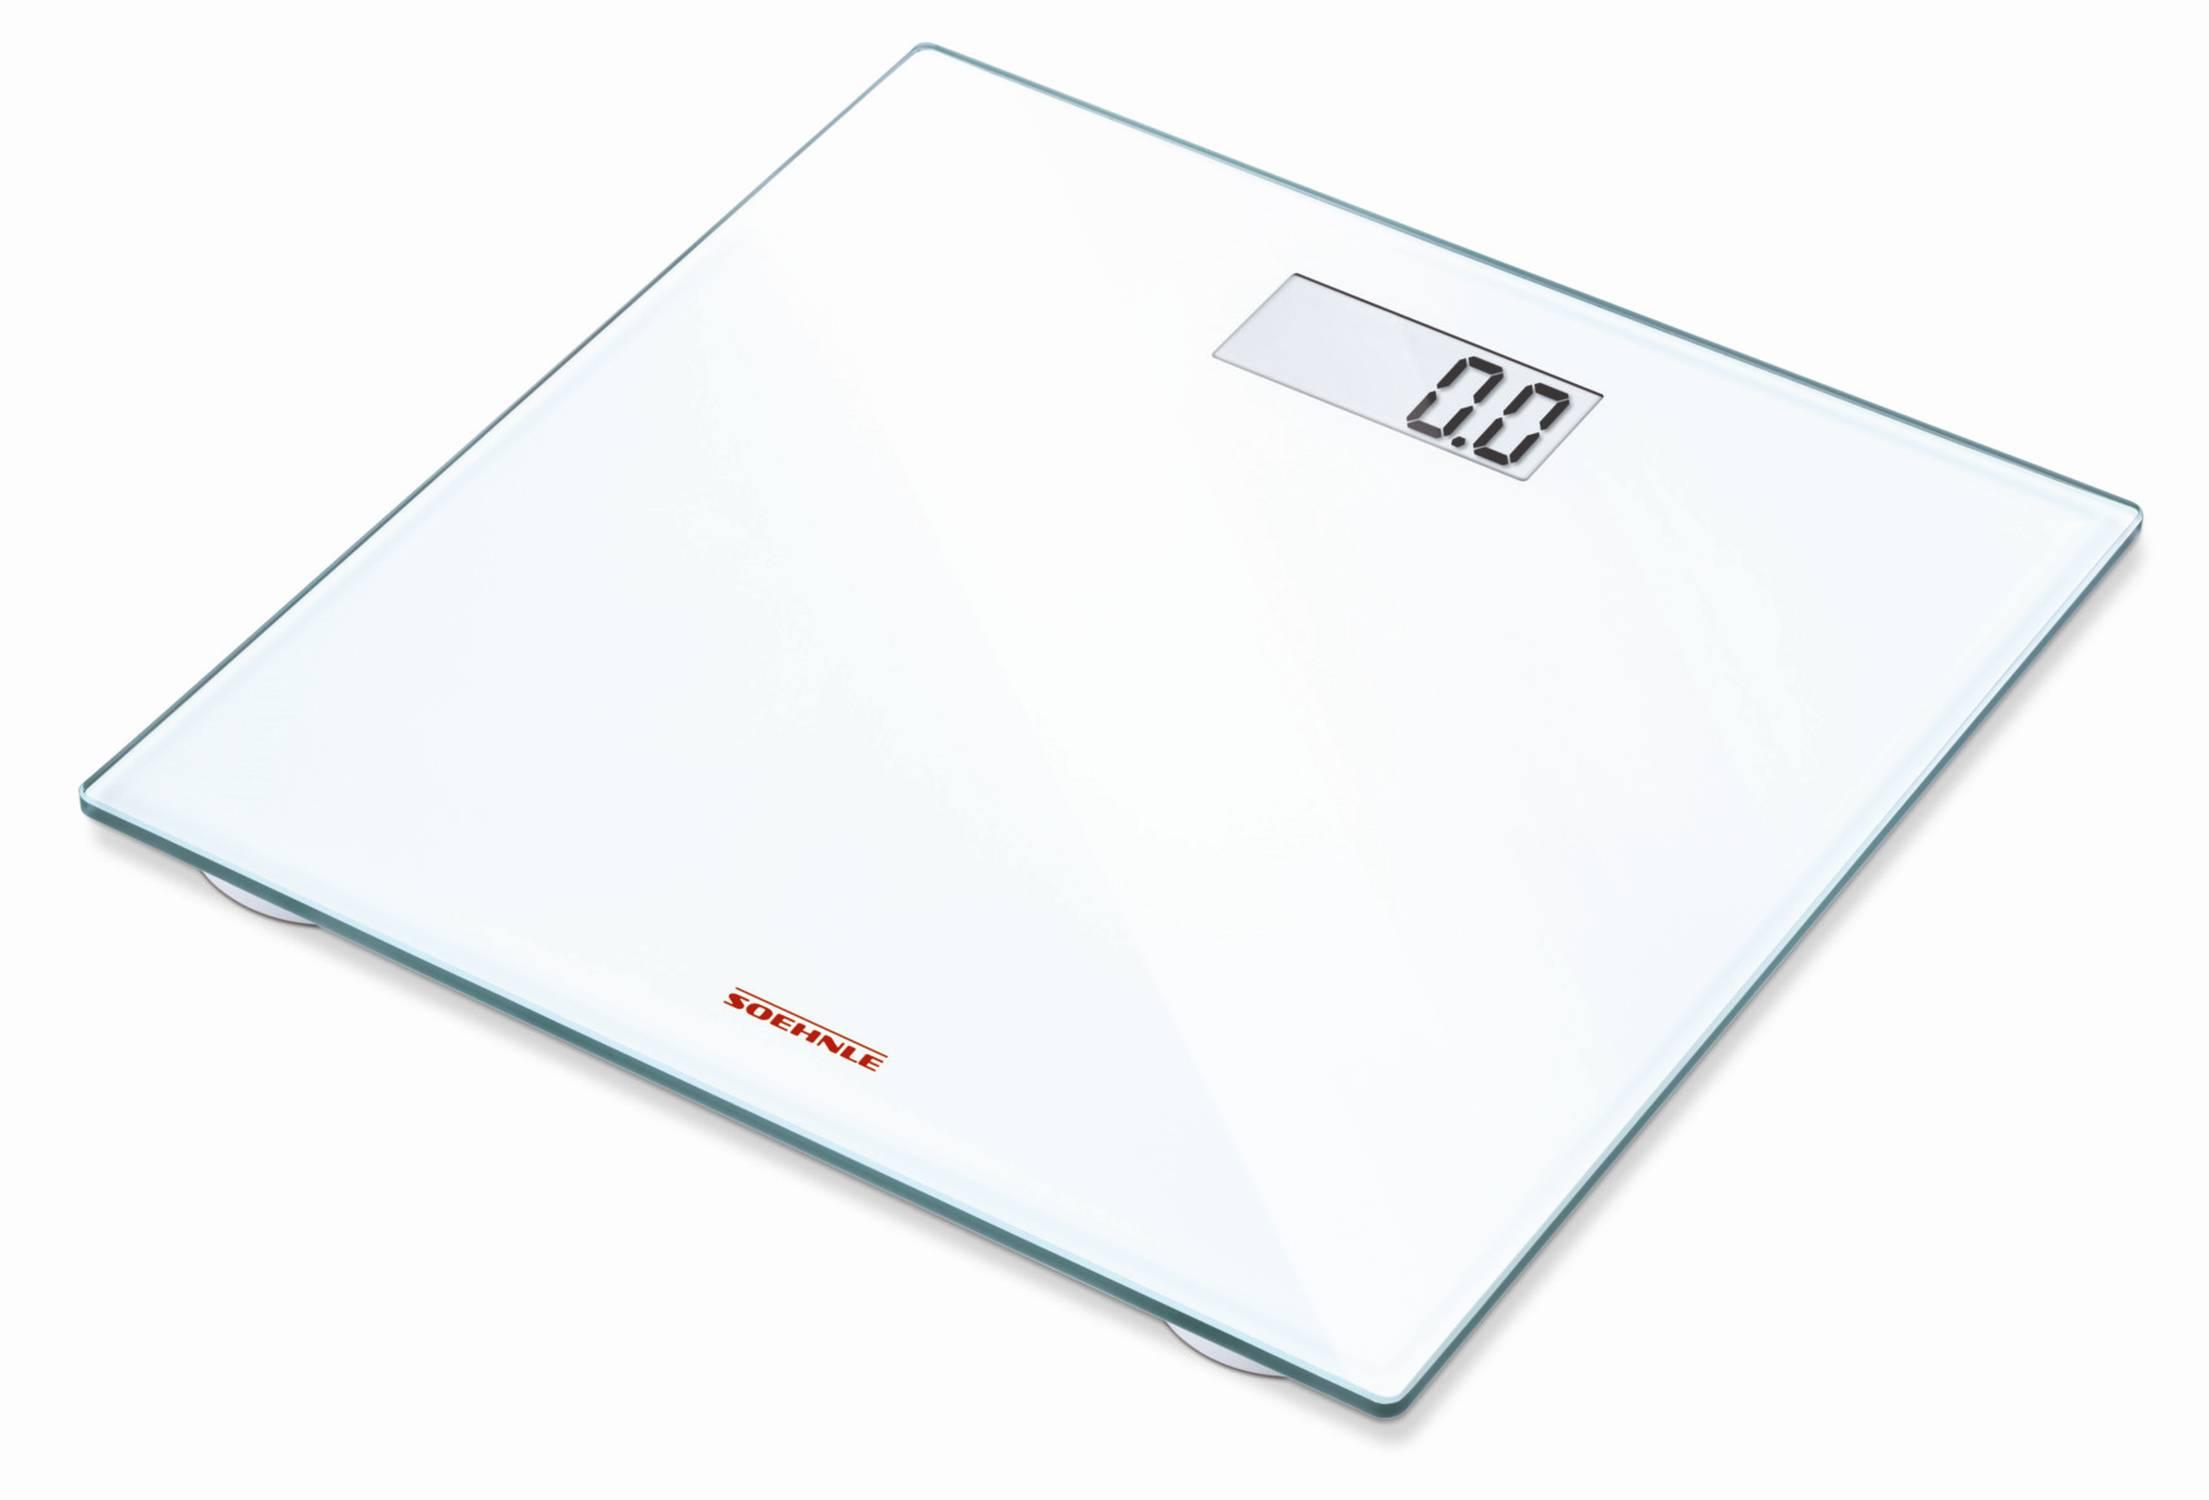 soehnle pino white digital personen waage bis 180 kg wei neu ebay. Black Bedroom Furniture Sets. Home Design Ideas